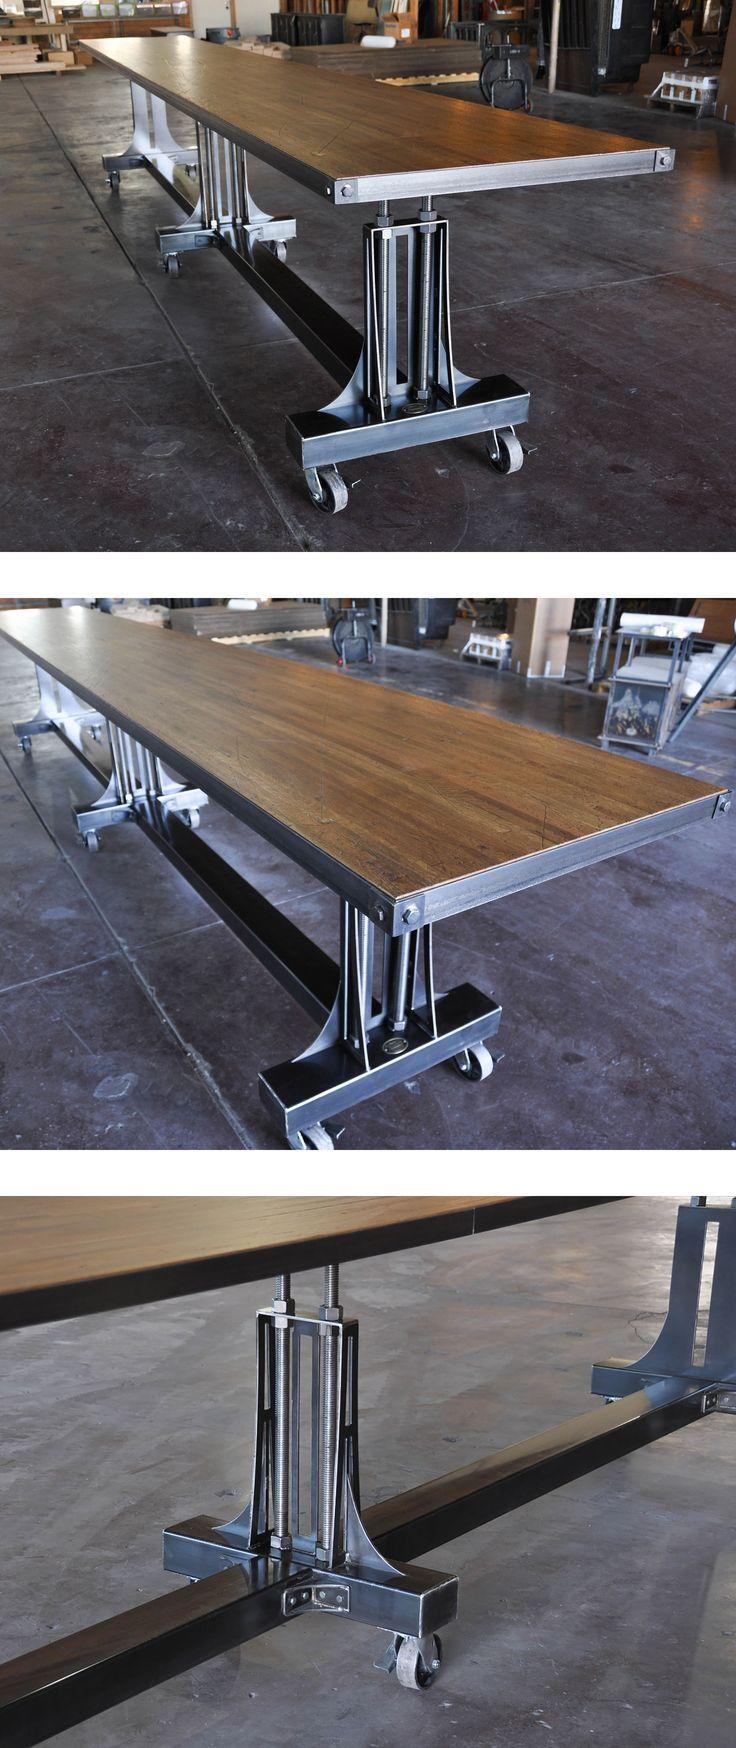 Post Industrial Table by Vintage Industrial Furniture in Phoenix, AZ